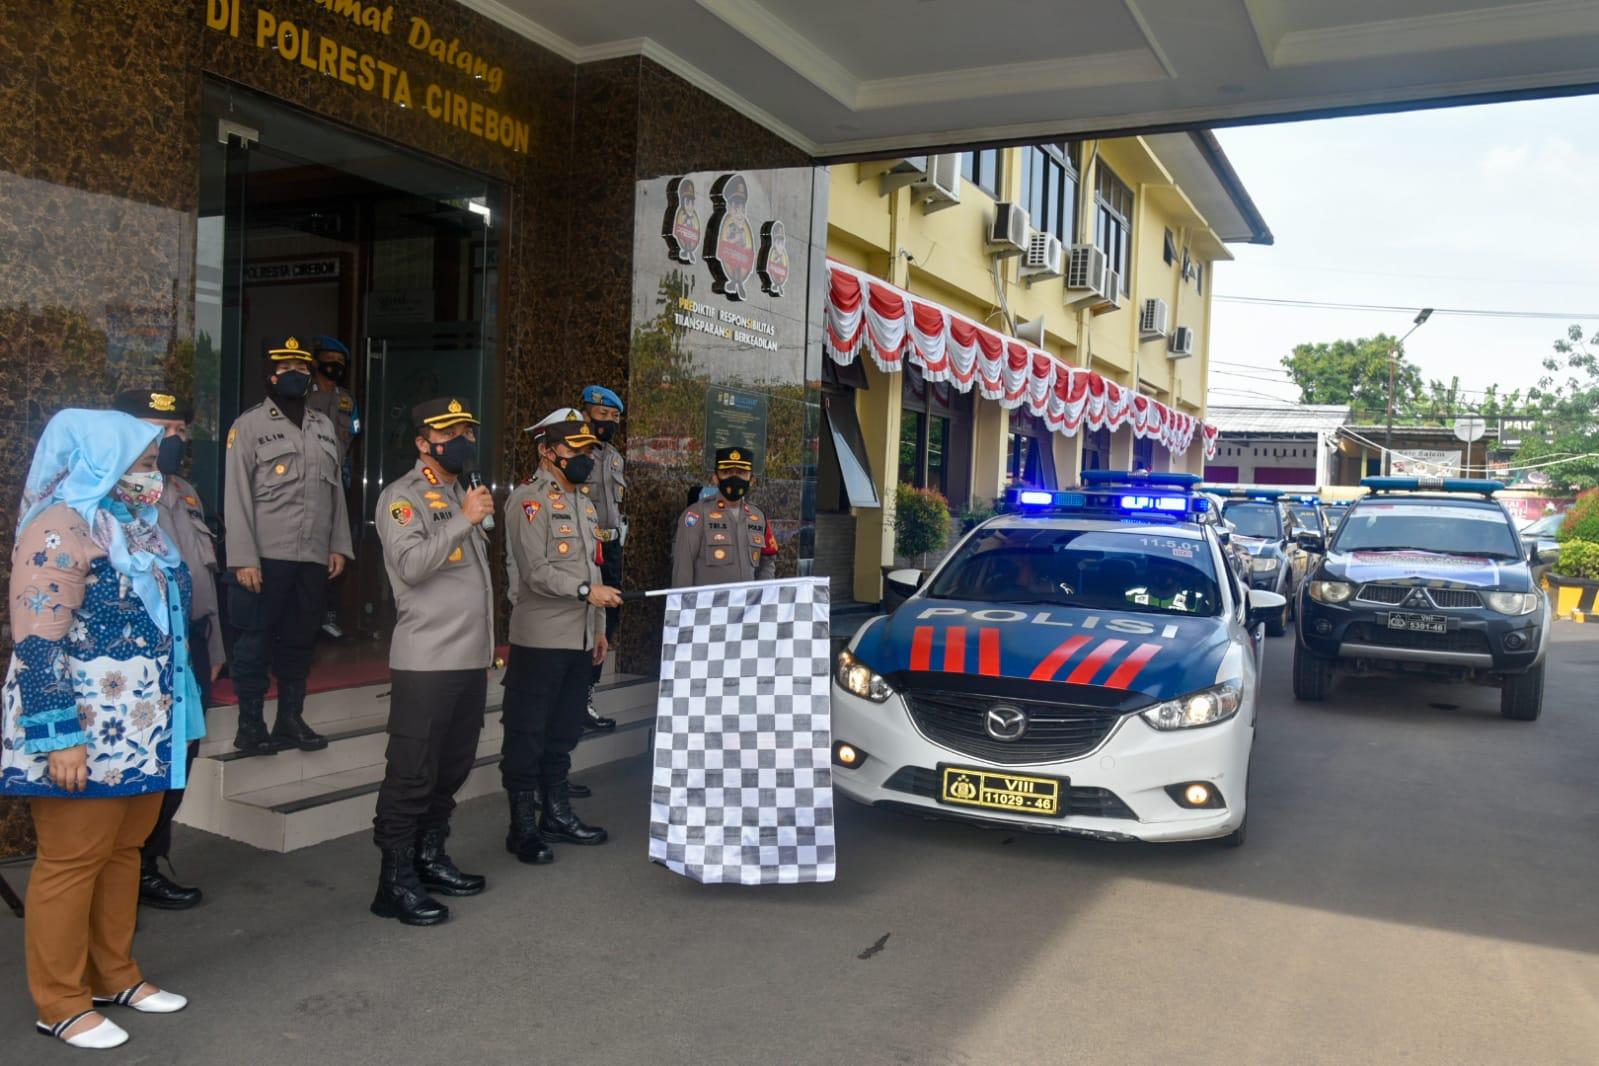 Polresta Cirebon Distribusikan Bantuan 50 Ton Beras dari Sekretariat Kepresidenan RI